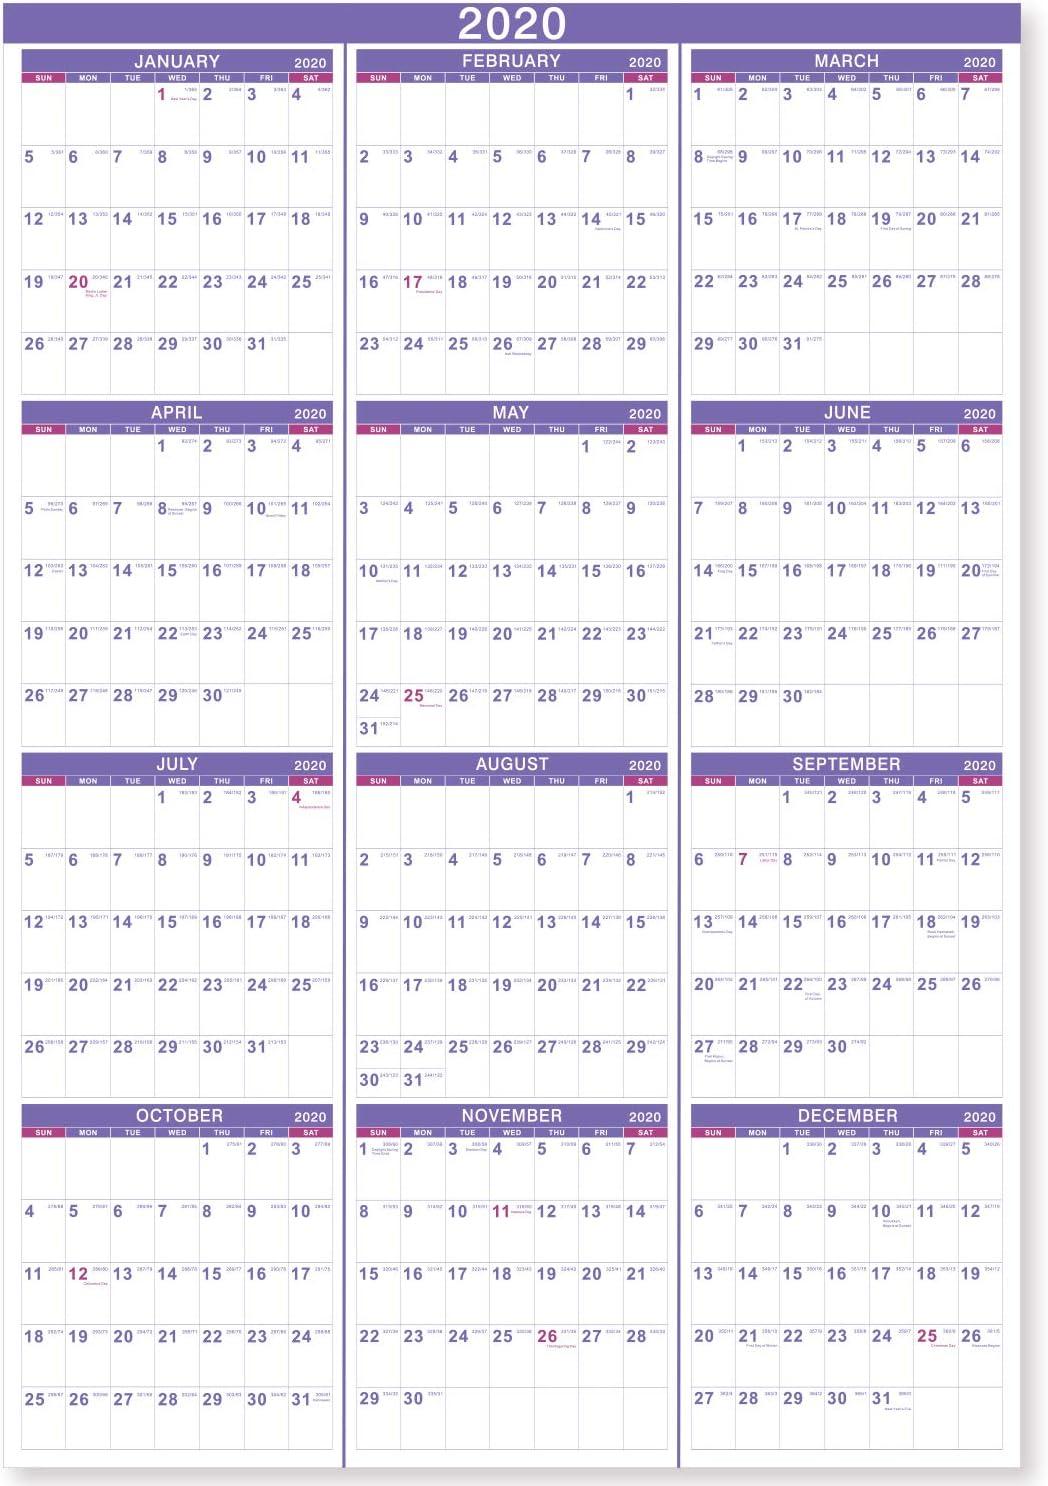 2020 Wall Calendar 2020 Yearly Wall Calendar Perfect for Organizing /& Plannin